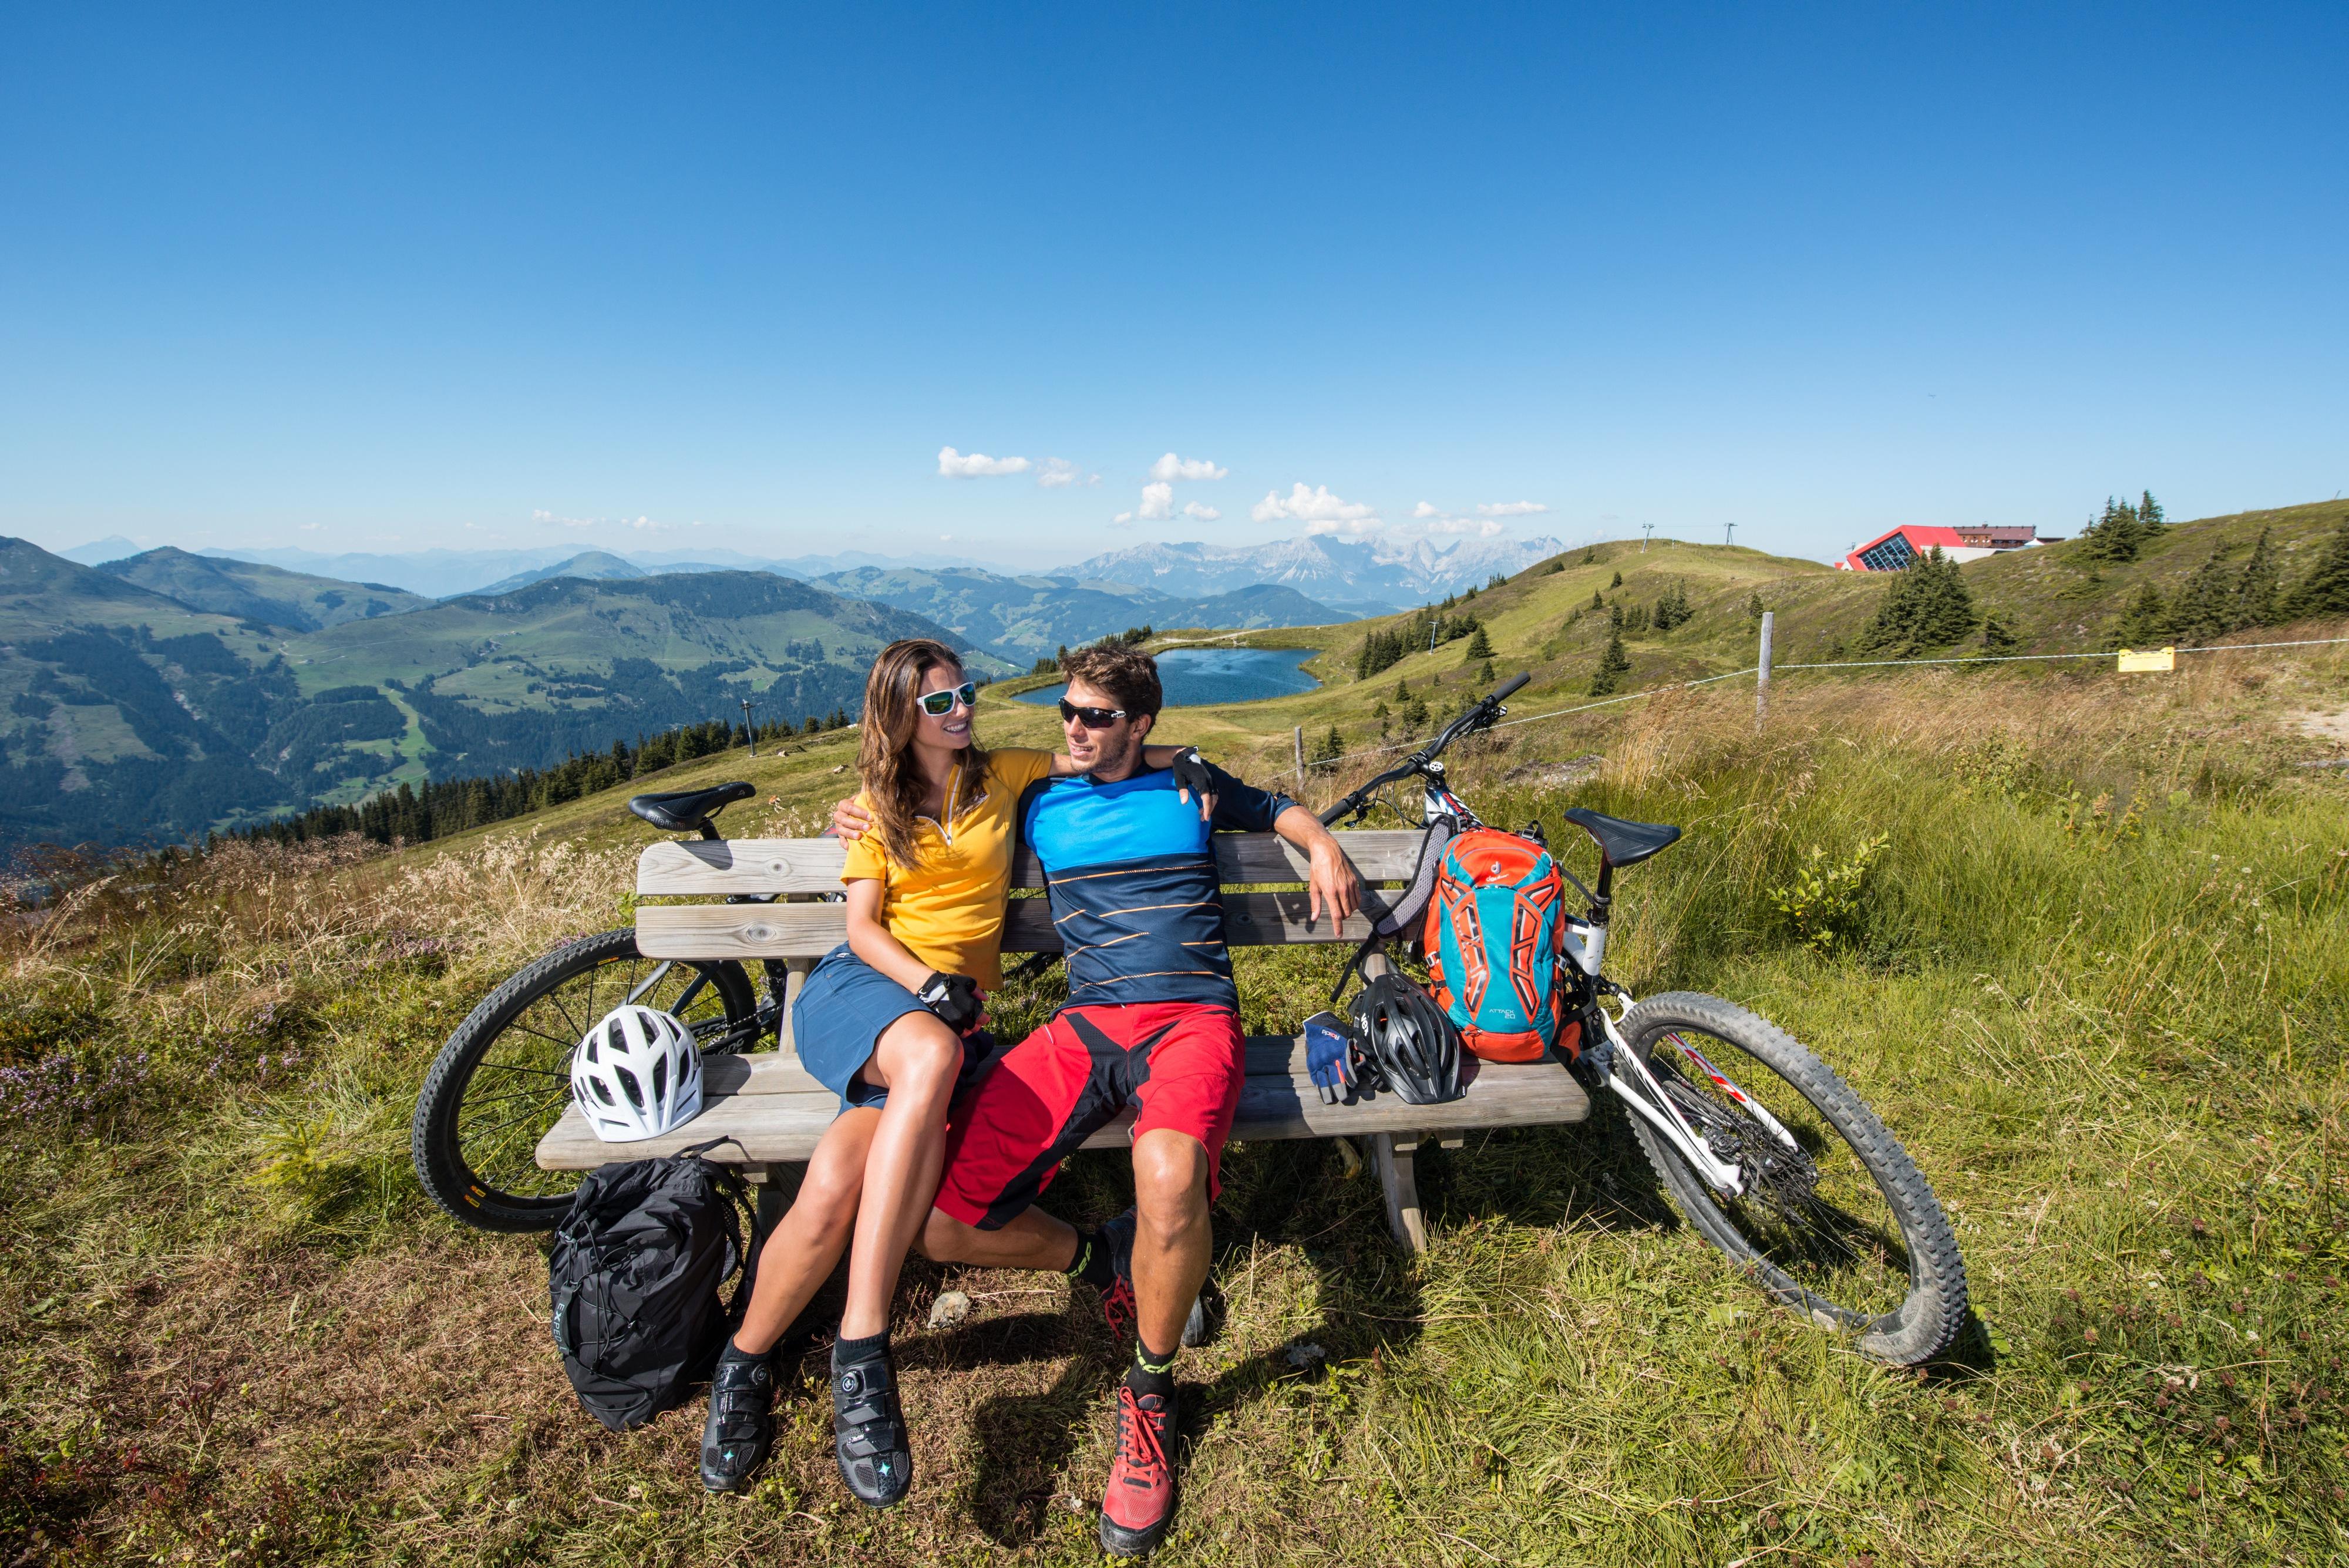 Fahrradfahren Rast Pause Paar Sommer